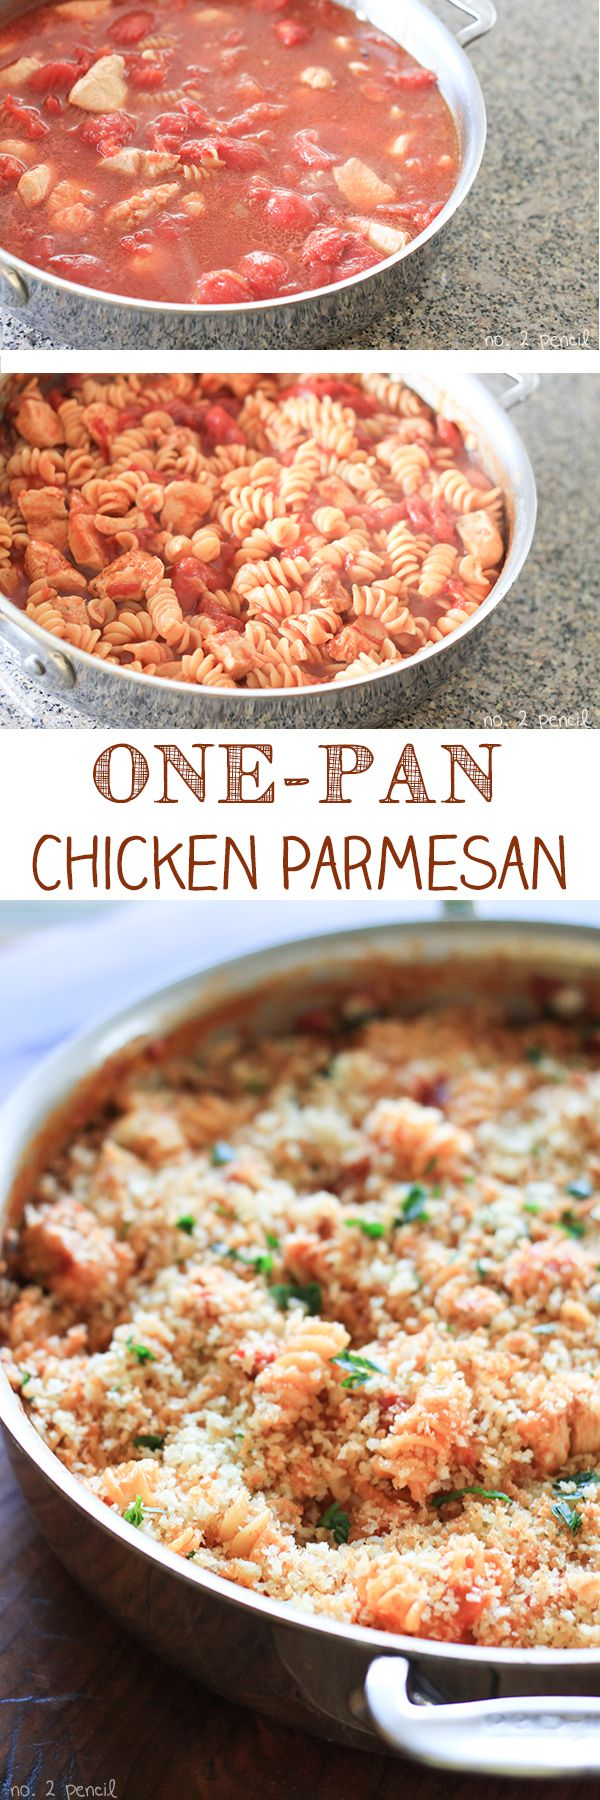 One Pan Chicken Parmesan Pasta